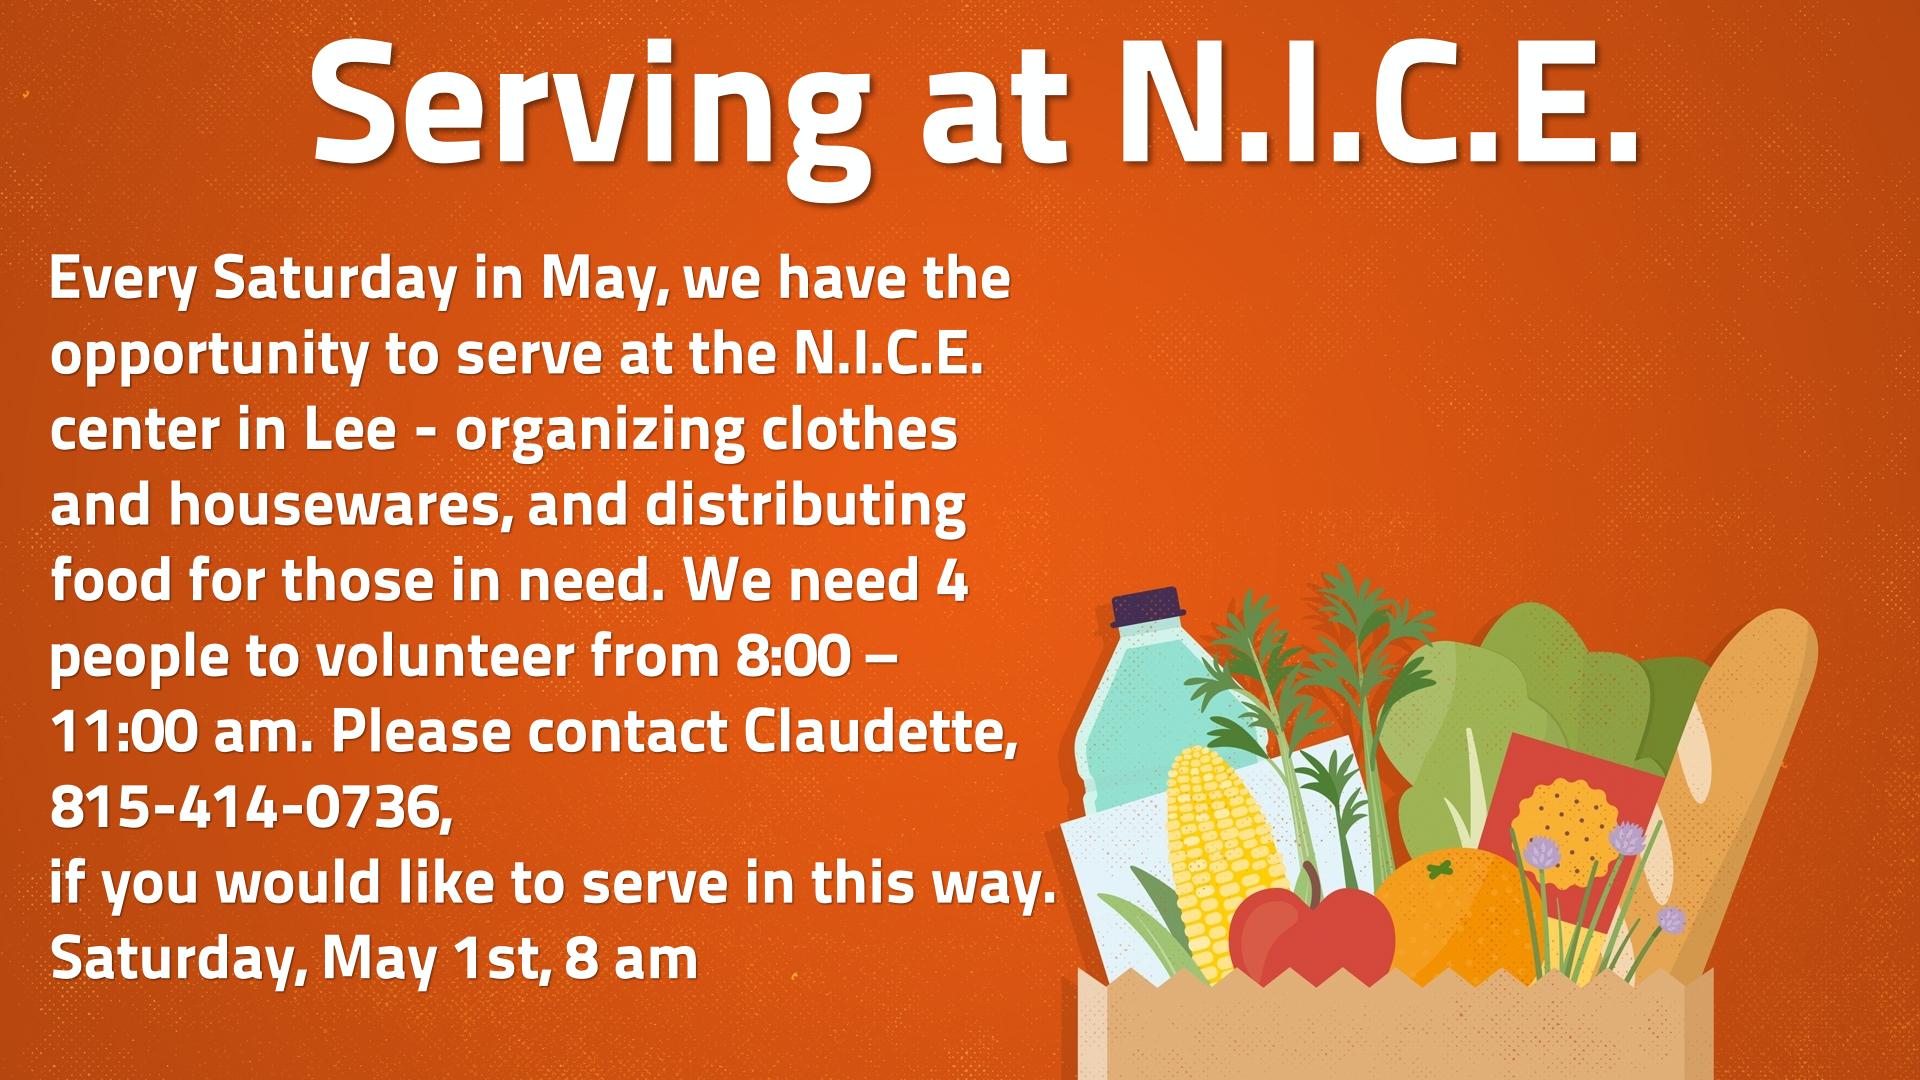 Serving at N.I.C.E.